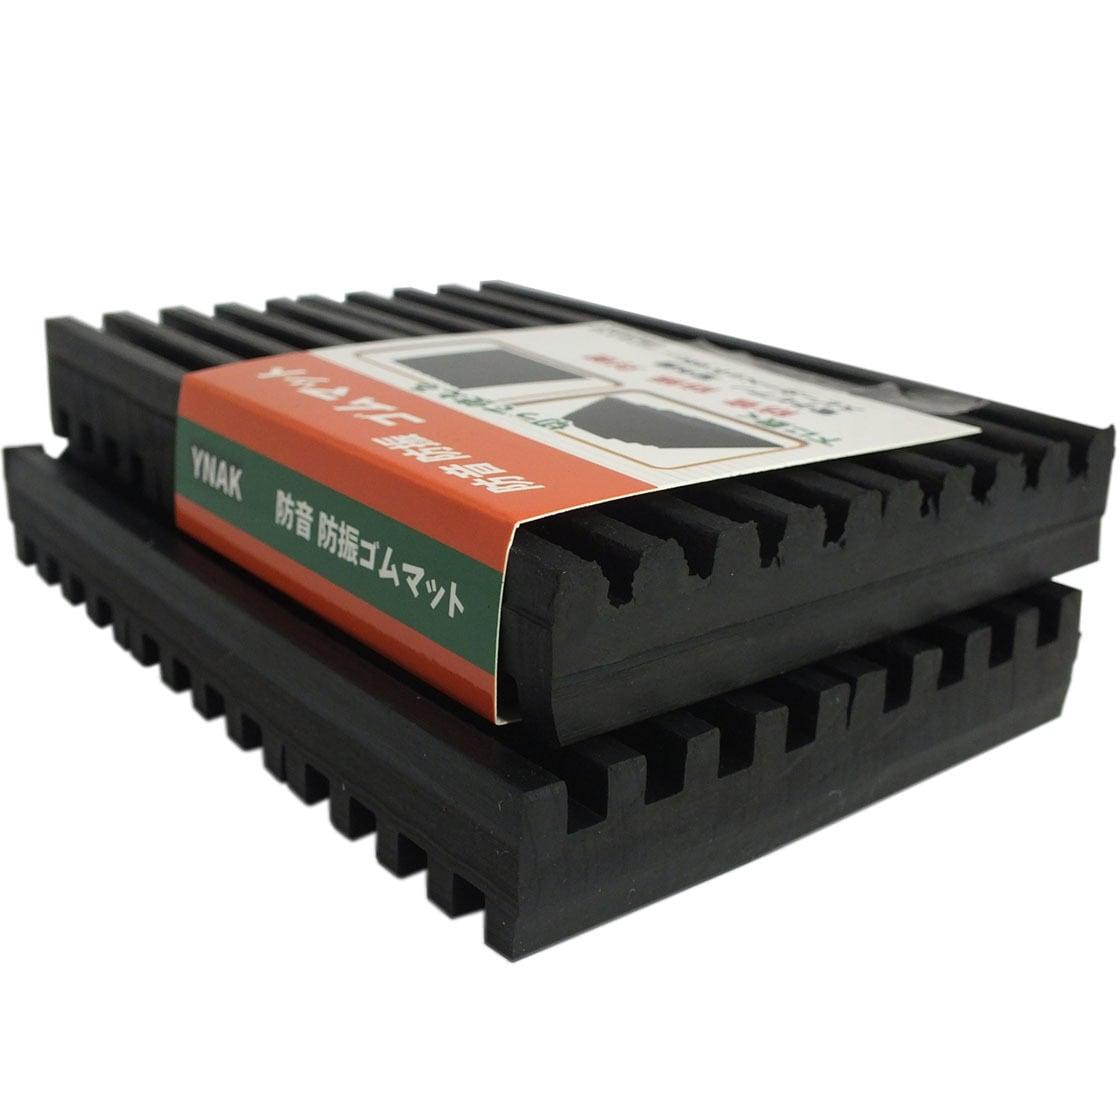 YNAK ピアノ スピーカー 家庭用機器 下に敷く 滑り止め ゴム マット セット 防振 防音 対策 (15cm×10cm×2cm 2枚)